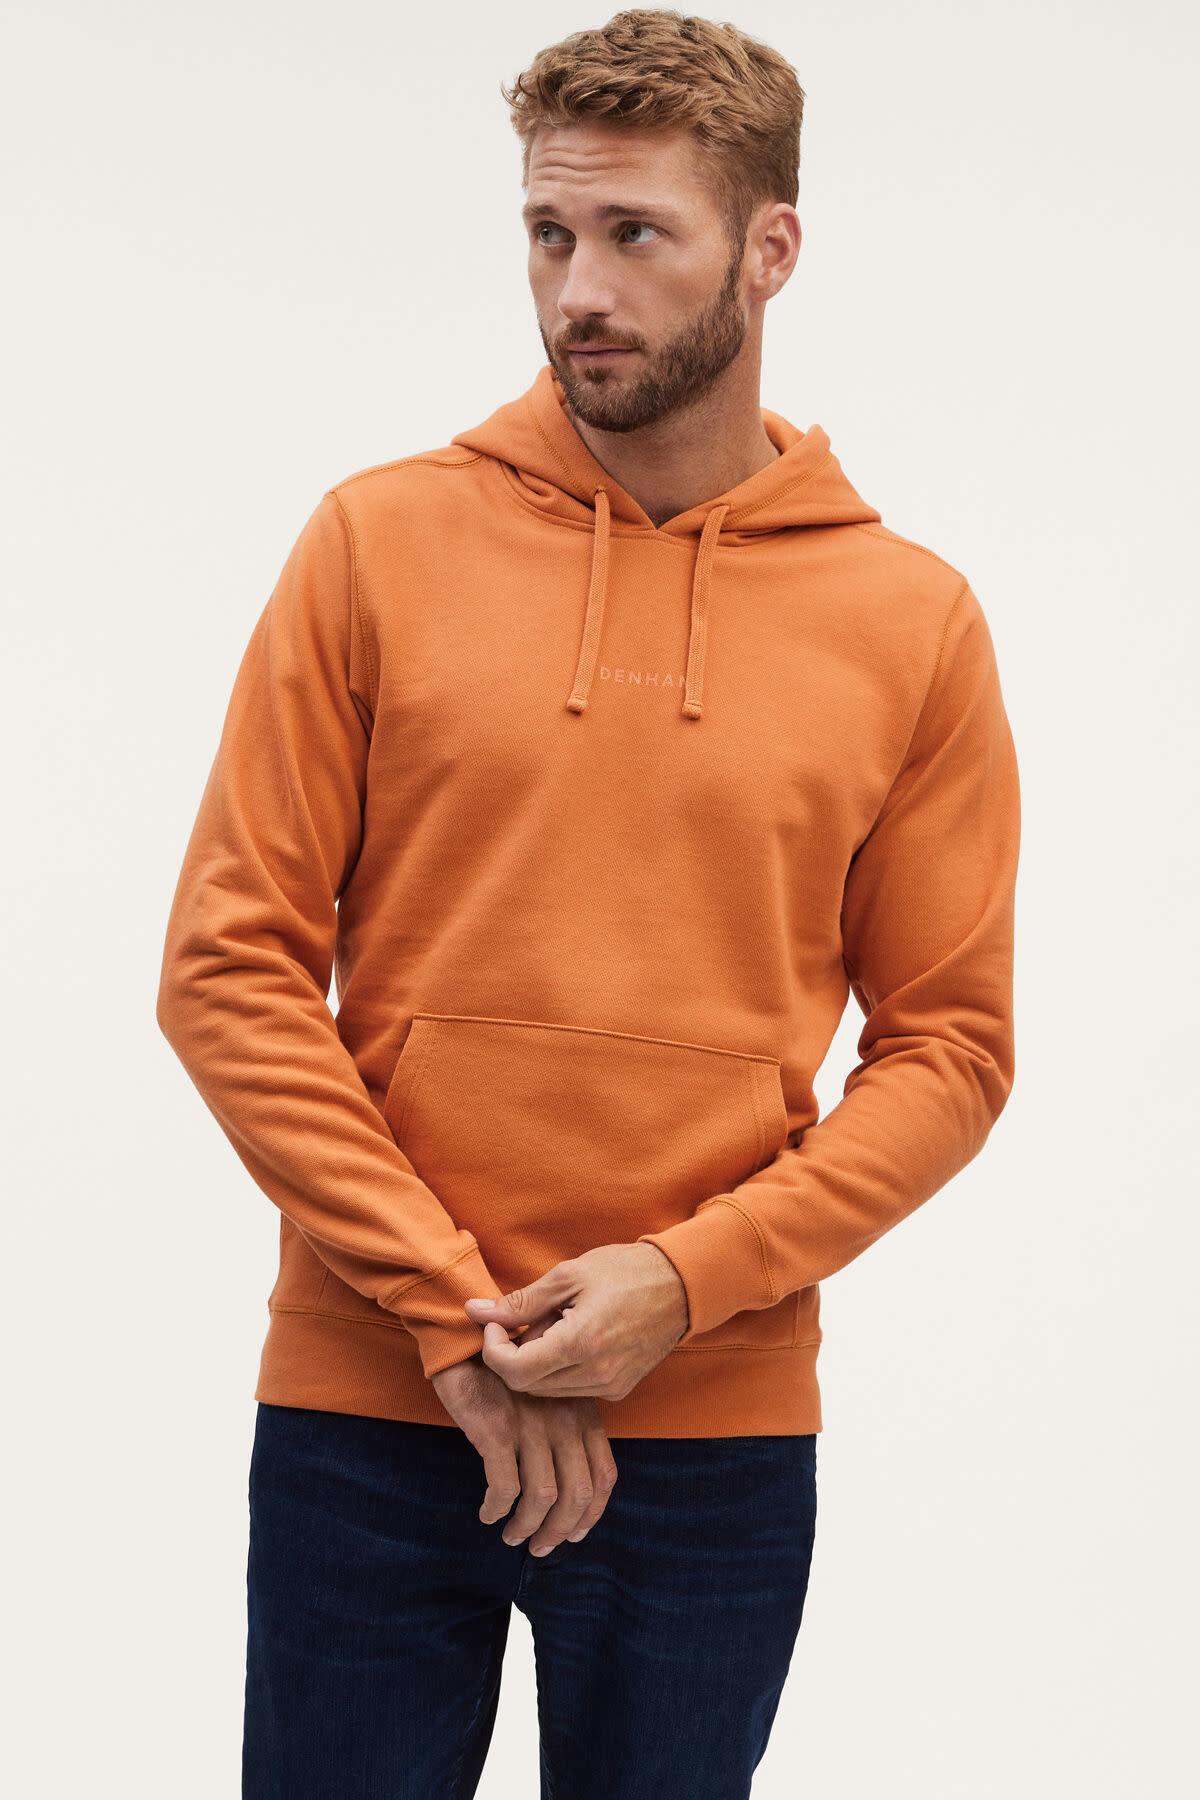 6 o clock  pocket Hoody orange-1